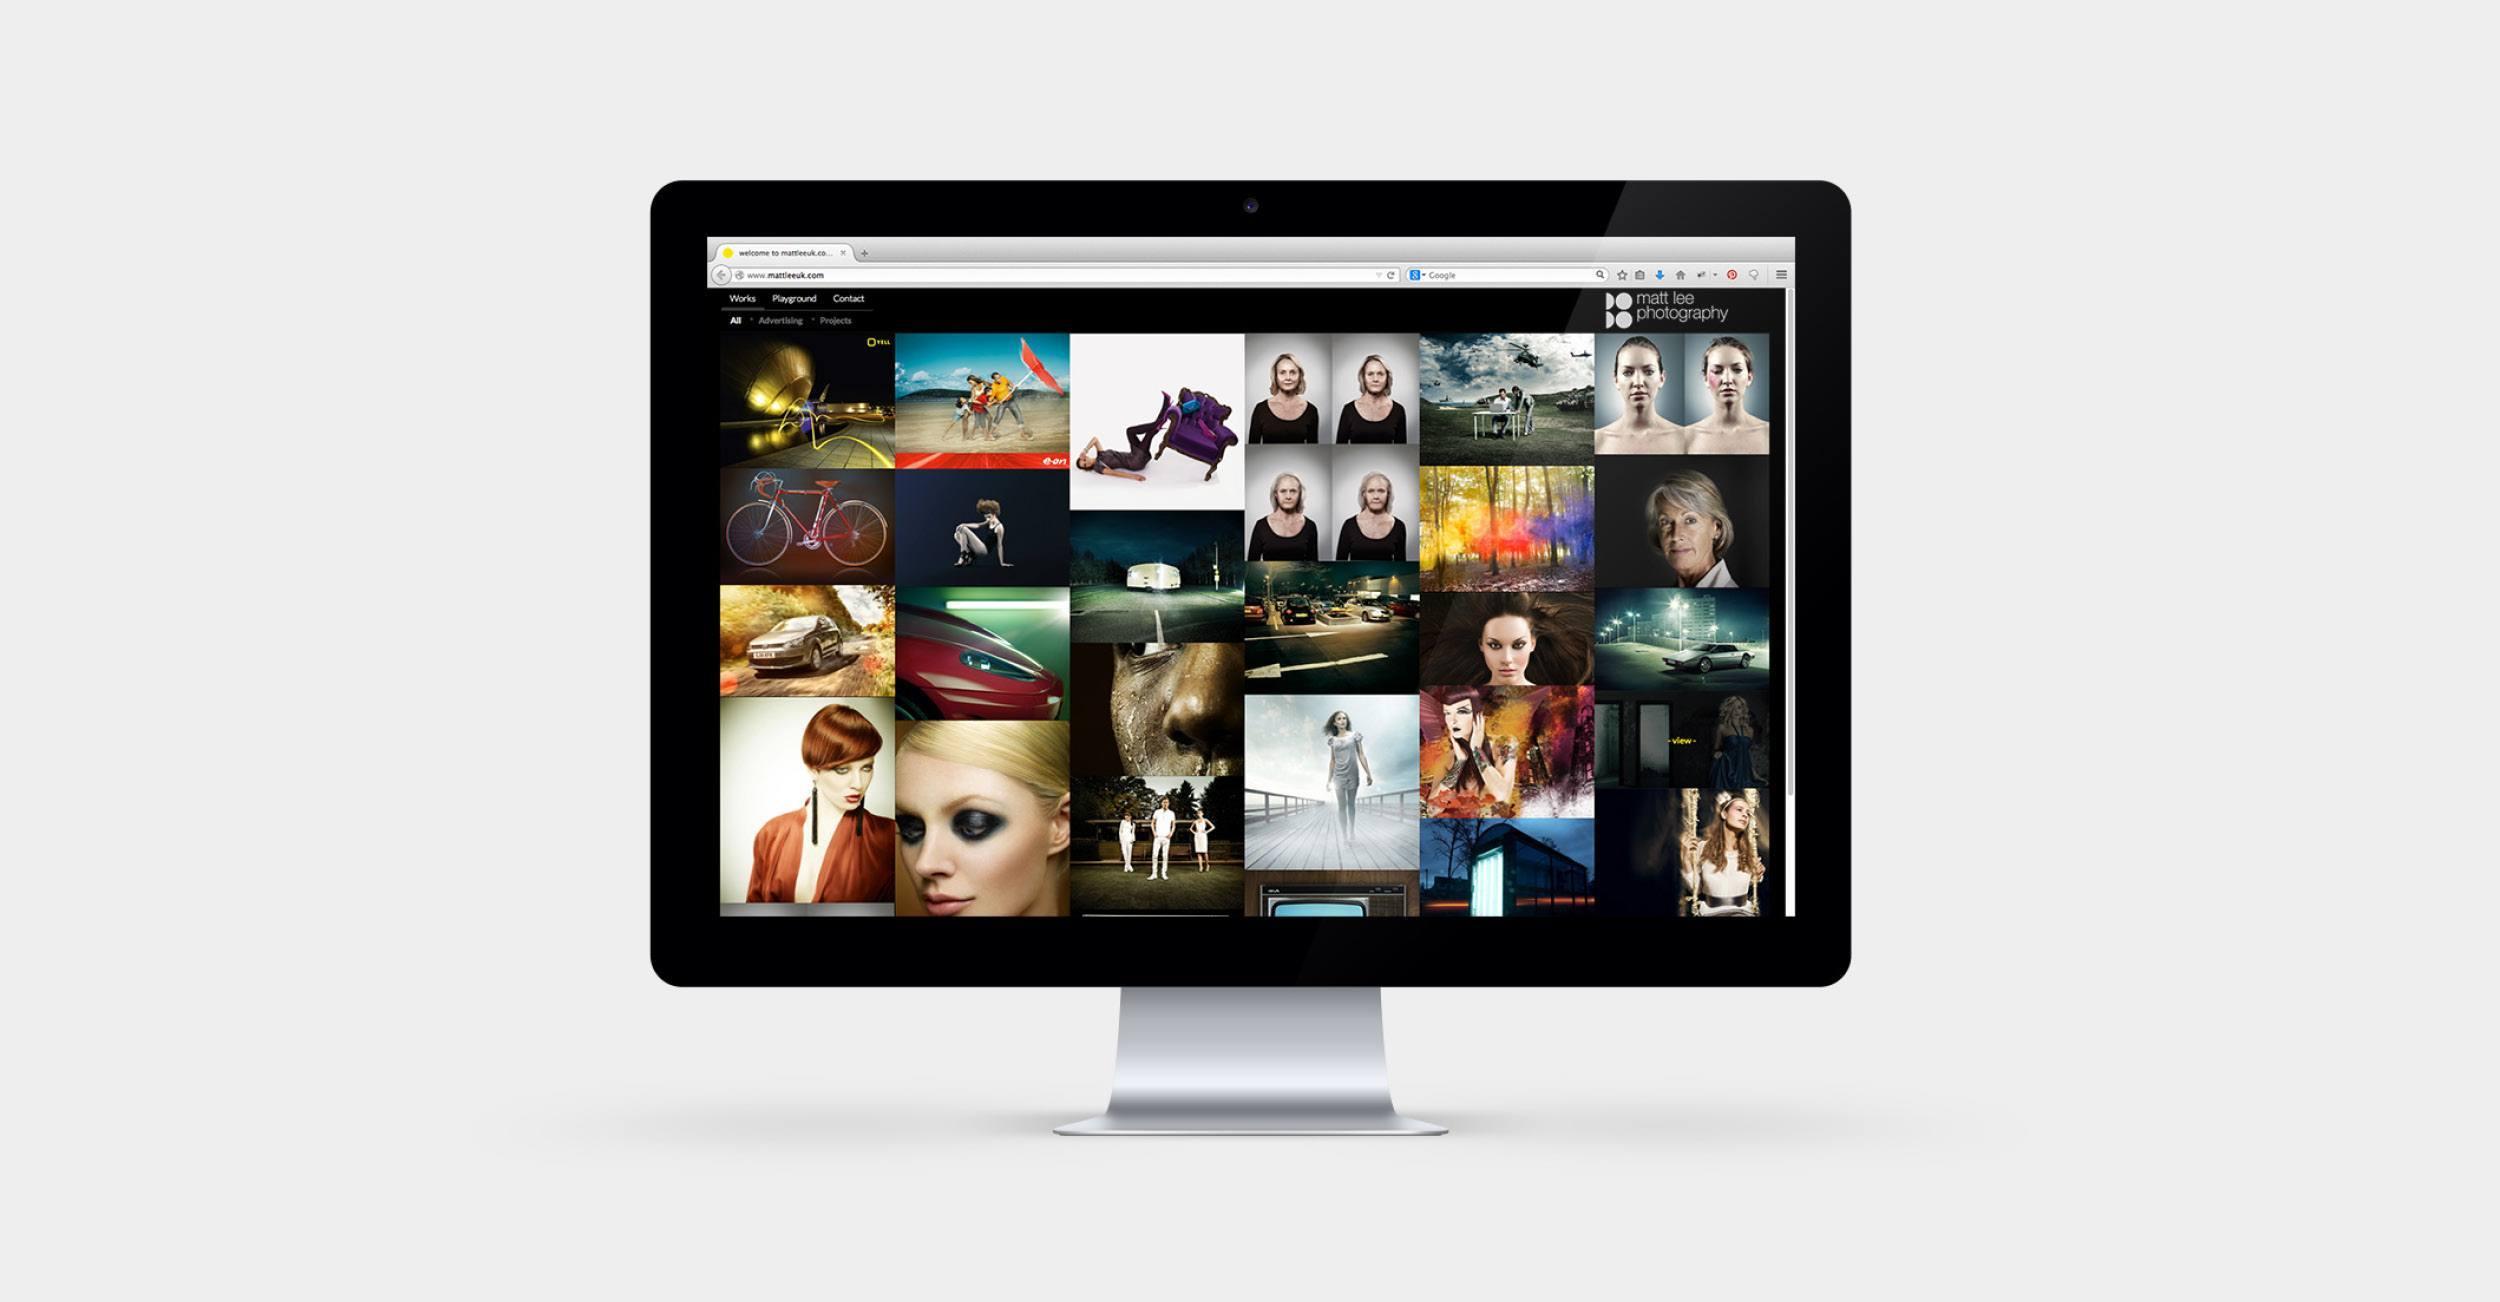 Matt Lee Photography - Responsive Wordpress Website Design & Development